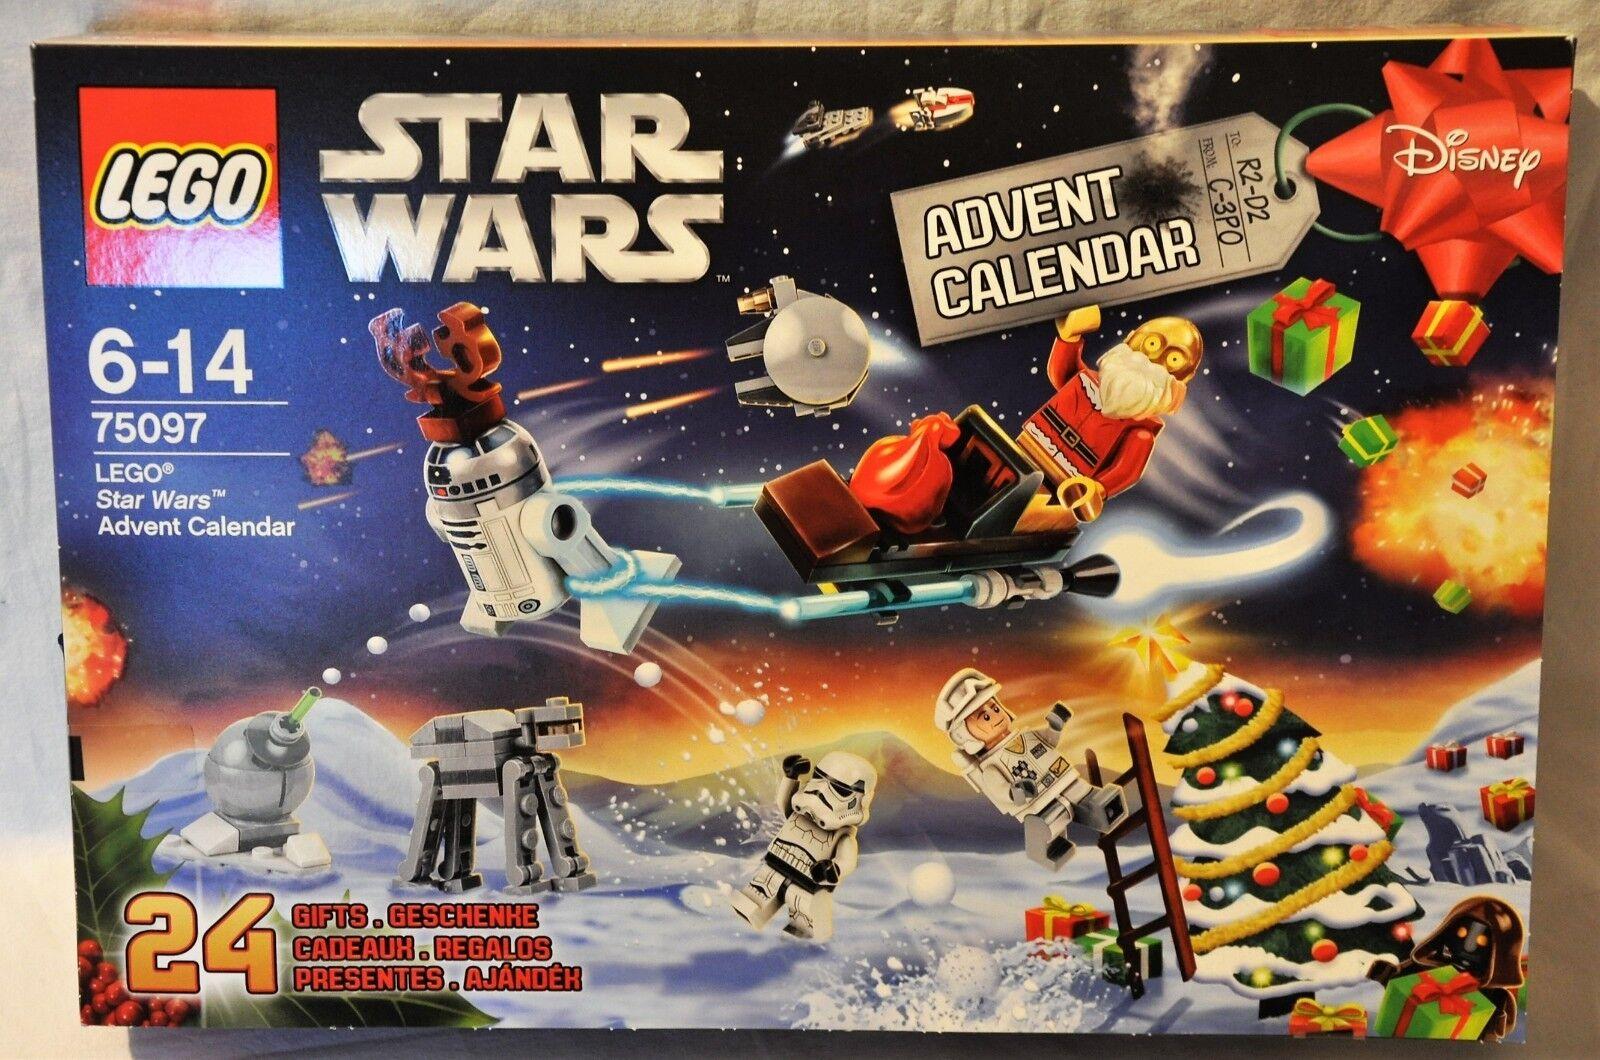 Lego 75097 Star Wars Adventskalender Adventskalender Adventskalender 2015 neu ungeöffnet f2323c